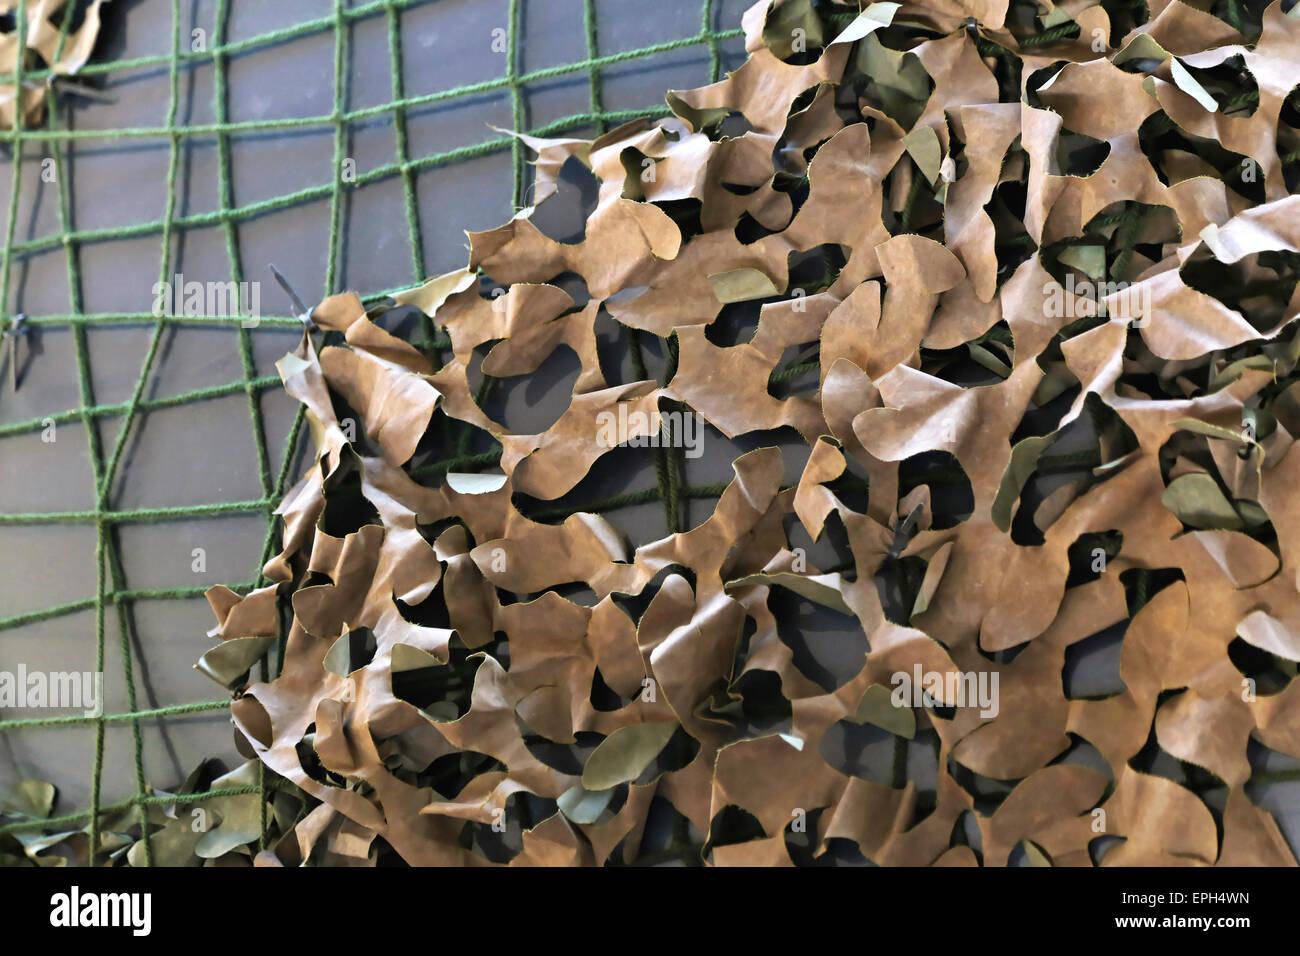 Camouflage netting - Stock Image